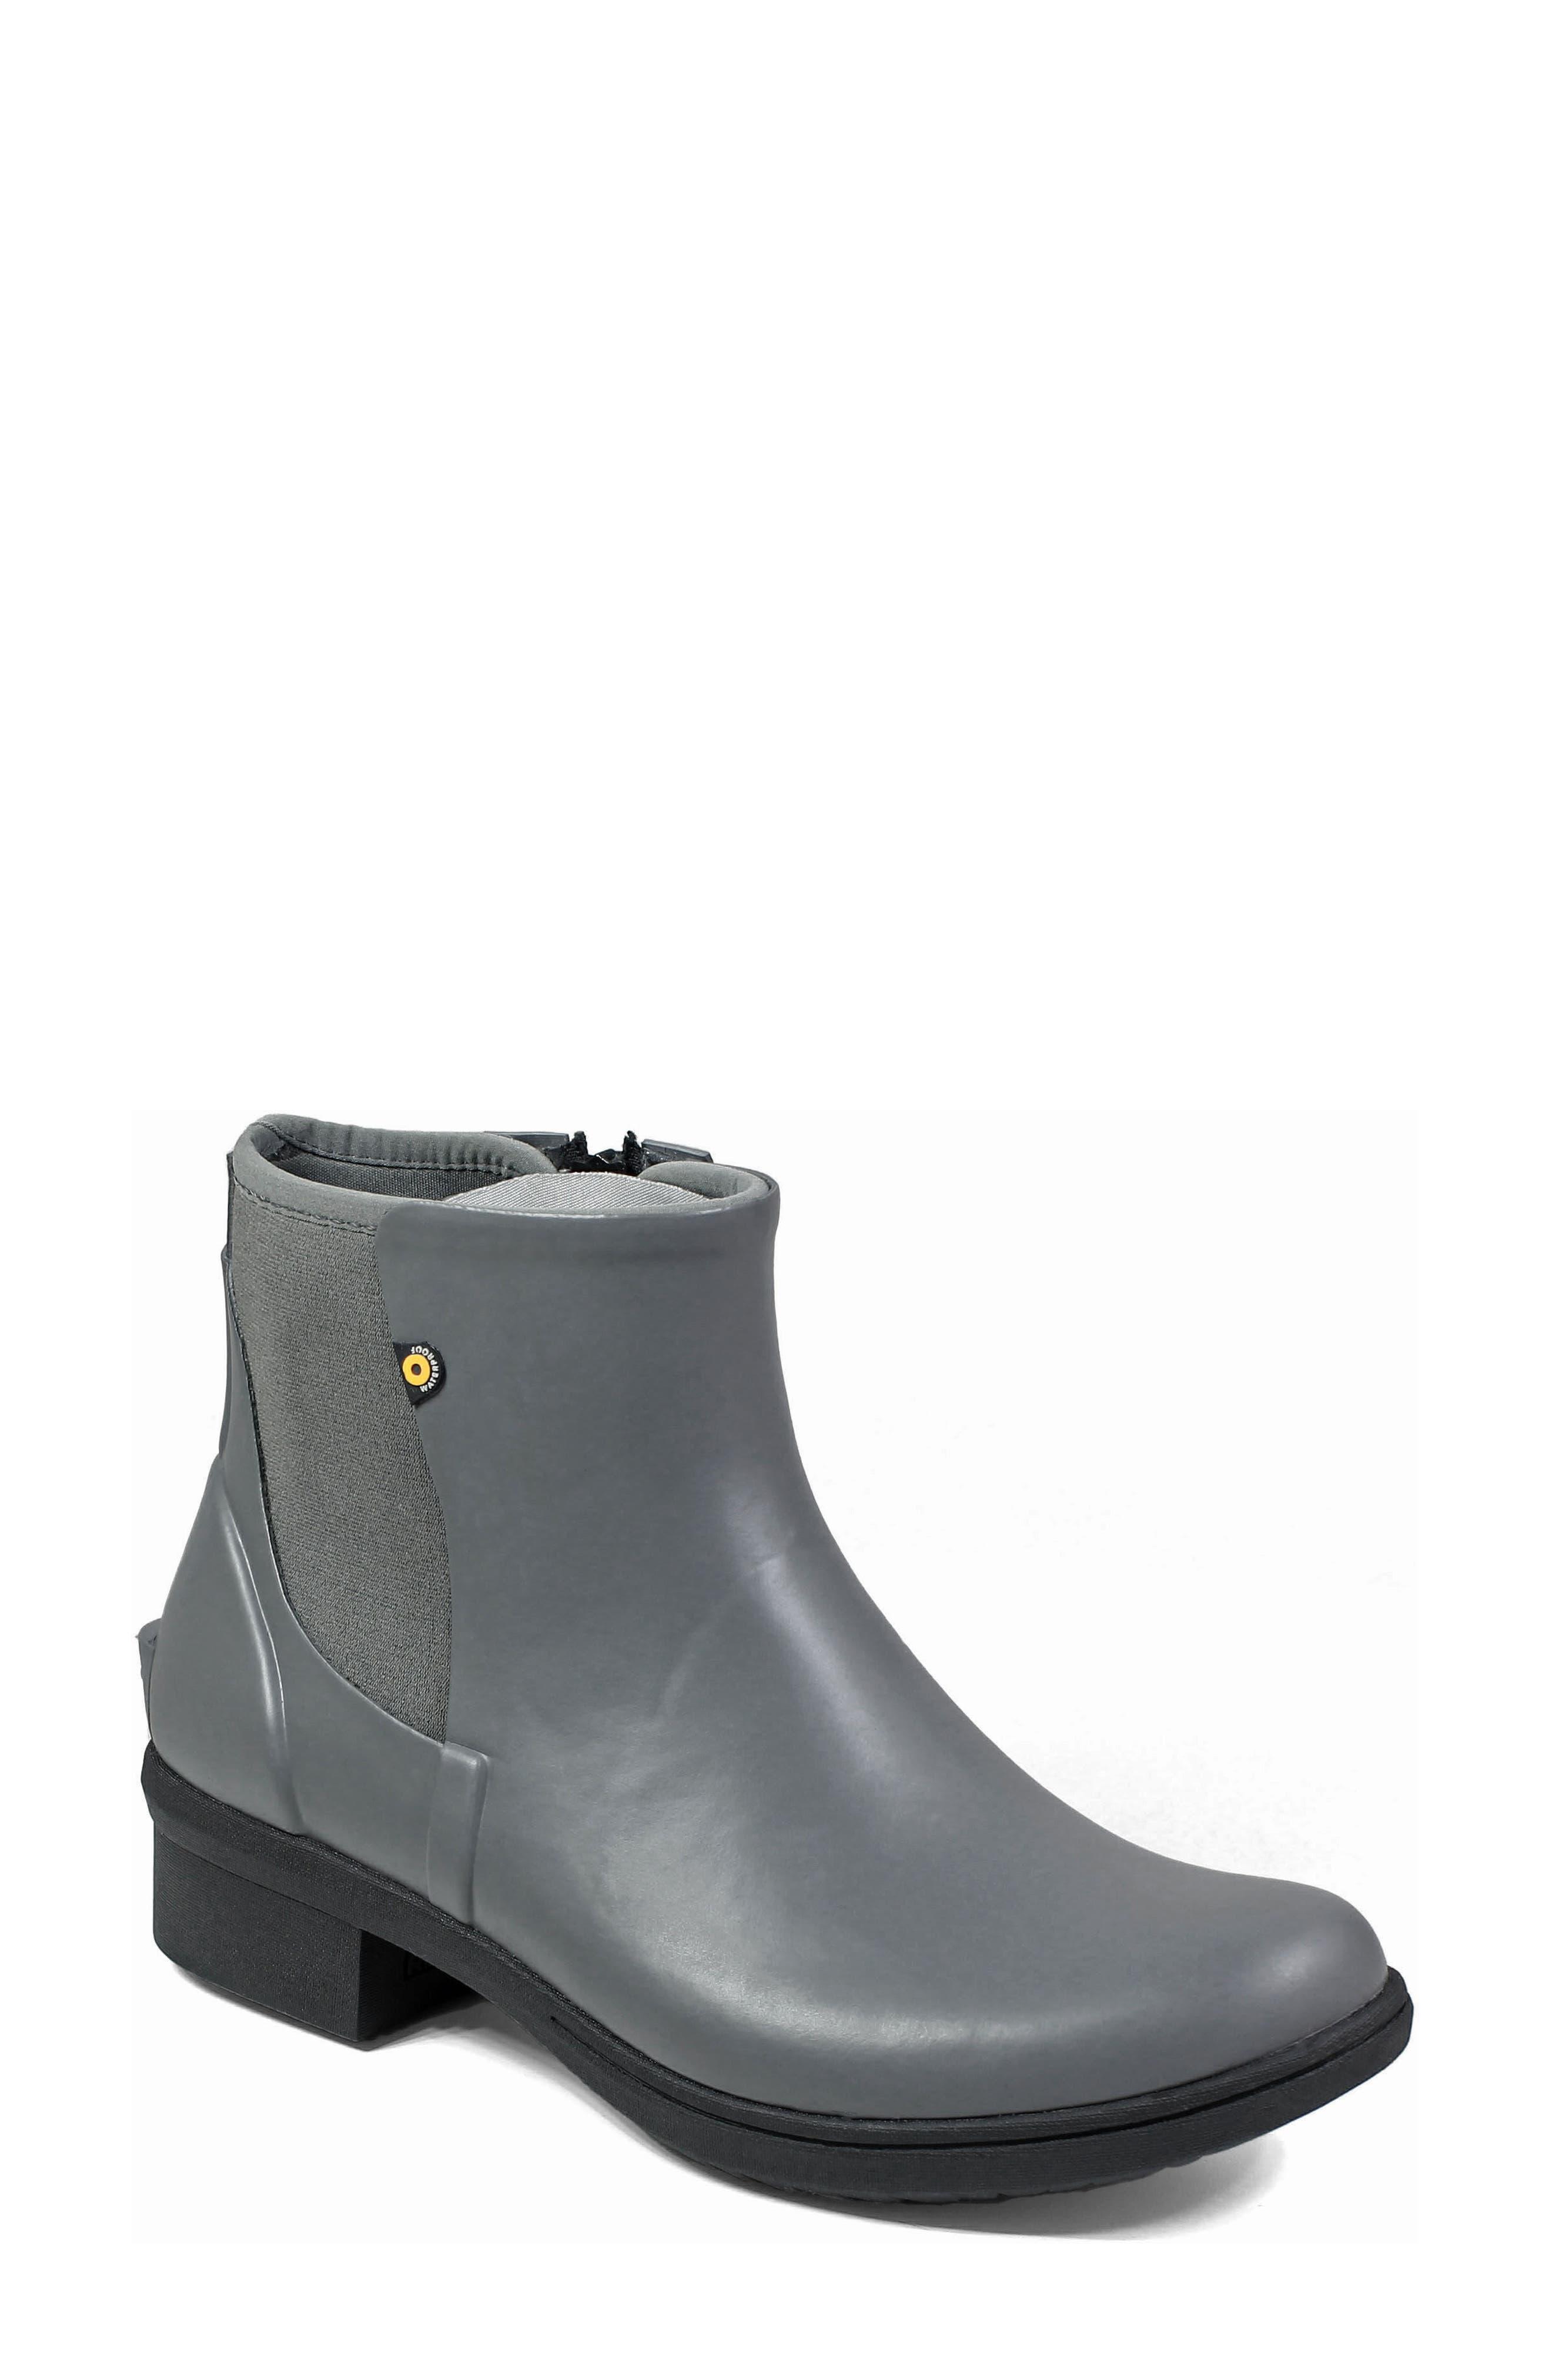 Auburn Insulated Waterproof Boot,                             Main thumbnail 1, color,                             Grey